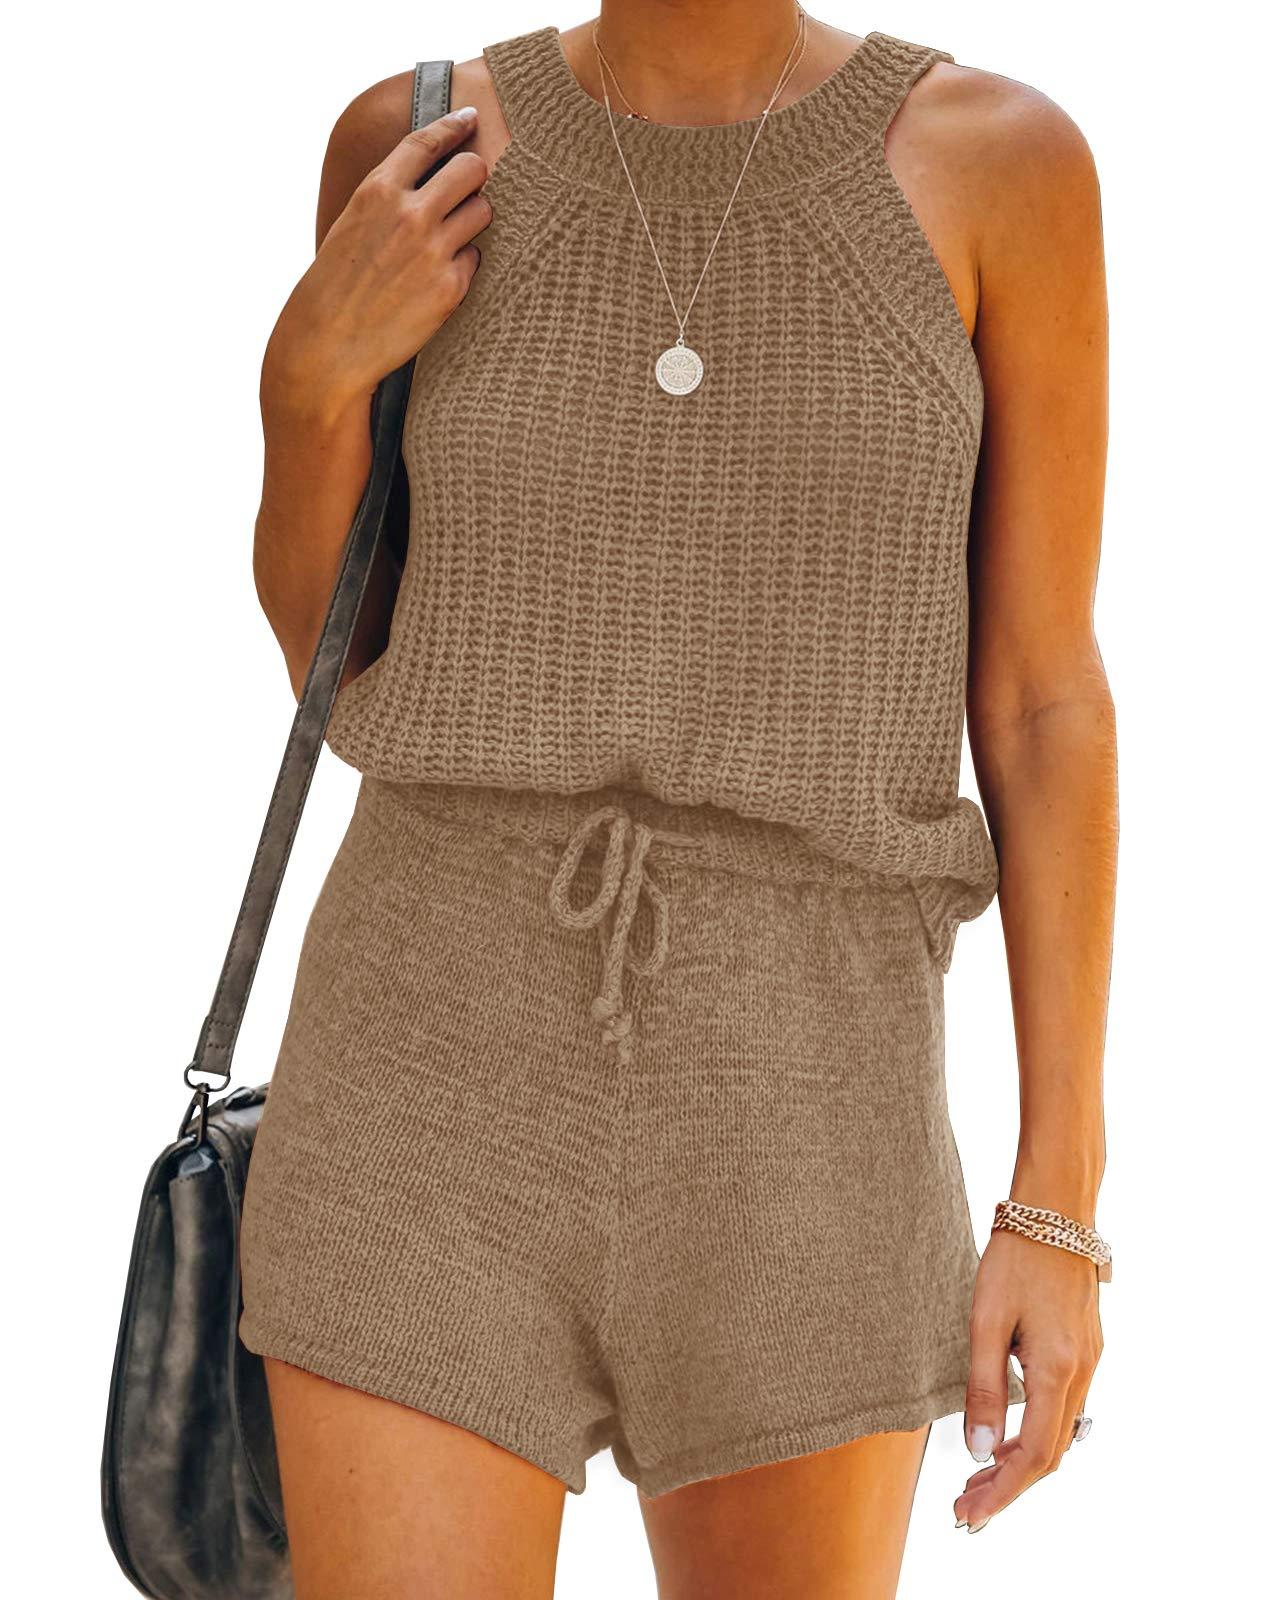 Saodimallsu Womens Two Piece Outfits Summer Halter High Neck Tank Top Ribbed Knit Sleeveless Shirts High Waist Shorts